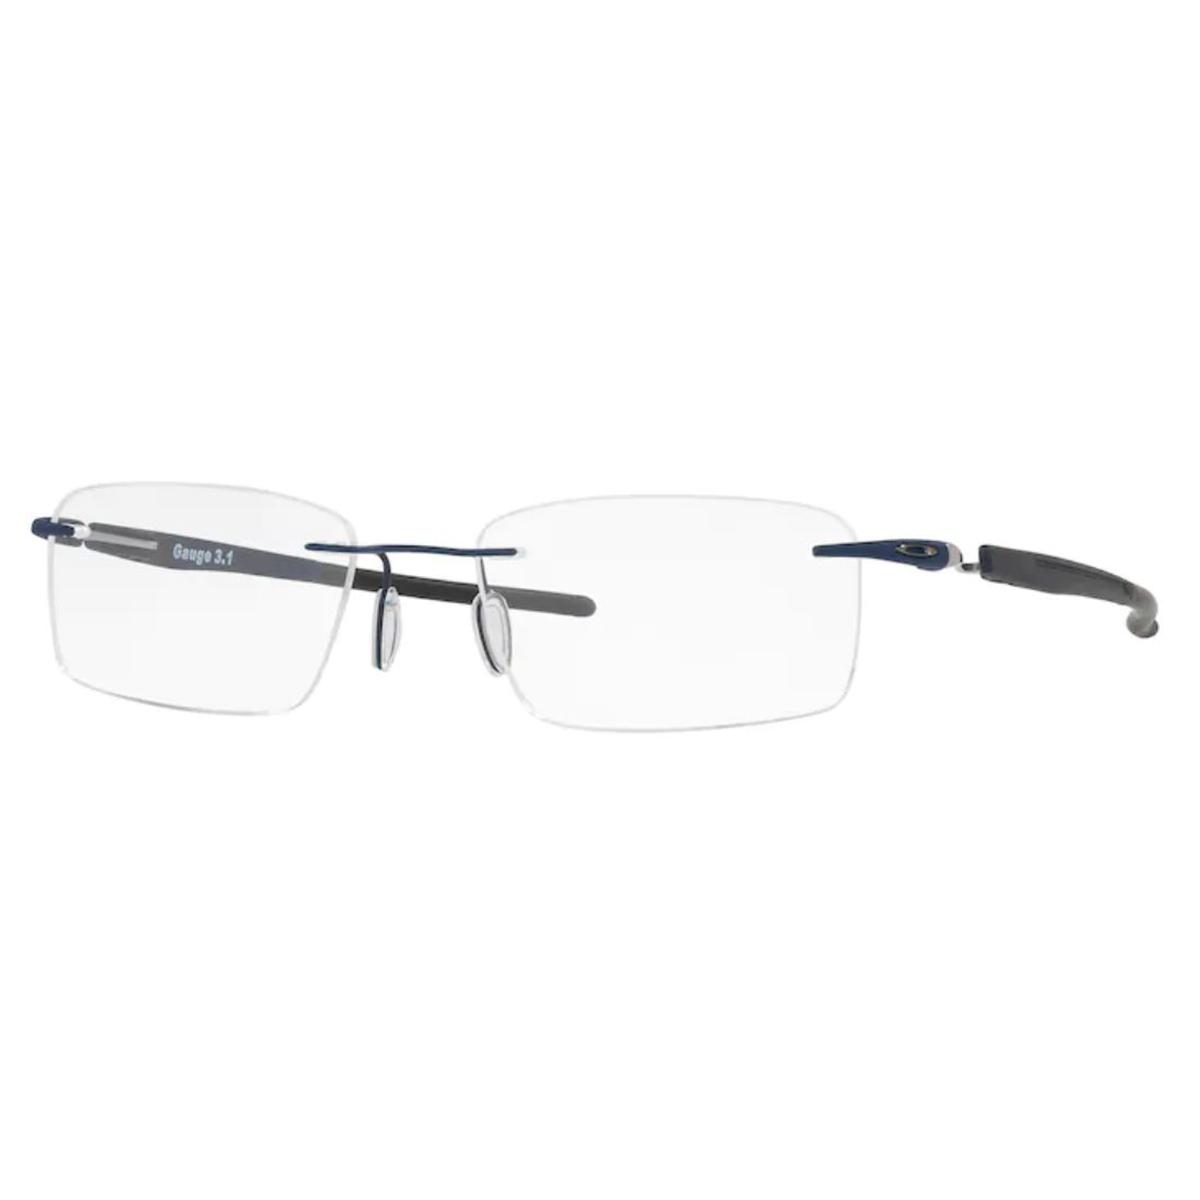 Óculos de Grau Oakley Gauge 3.1 OX5126 Titânio Azul Marinho